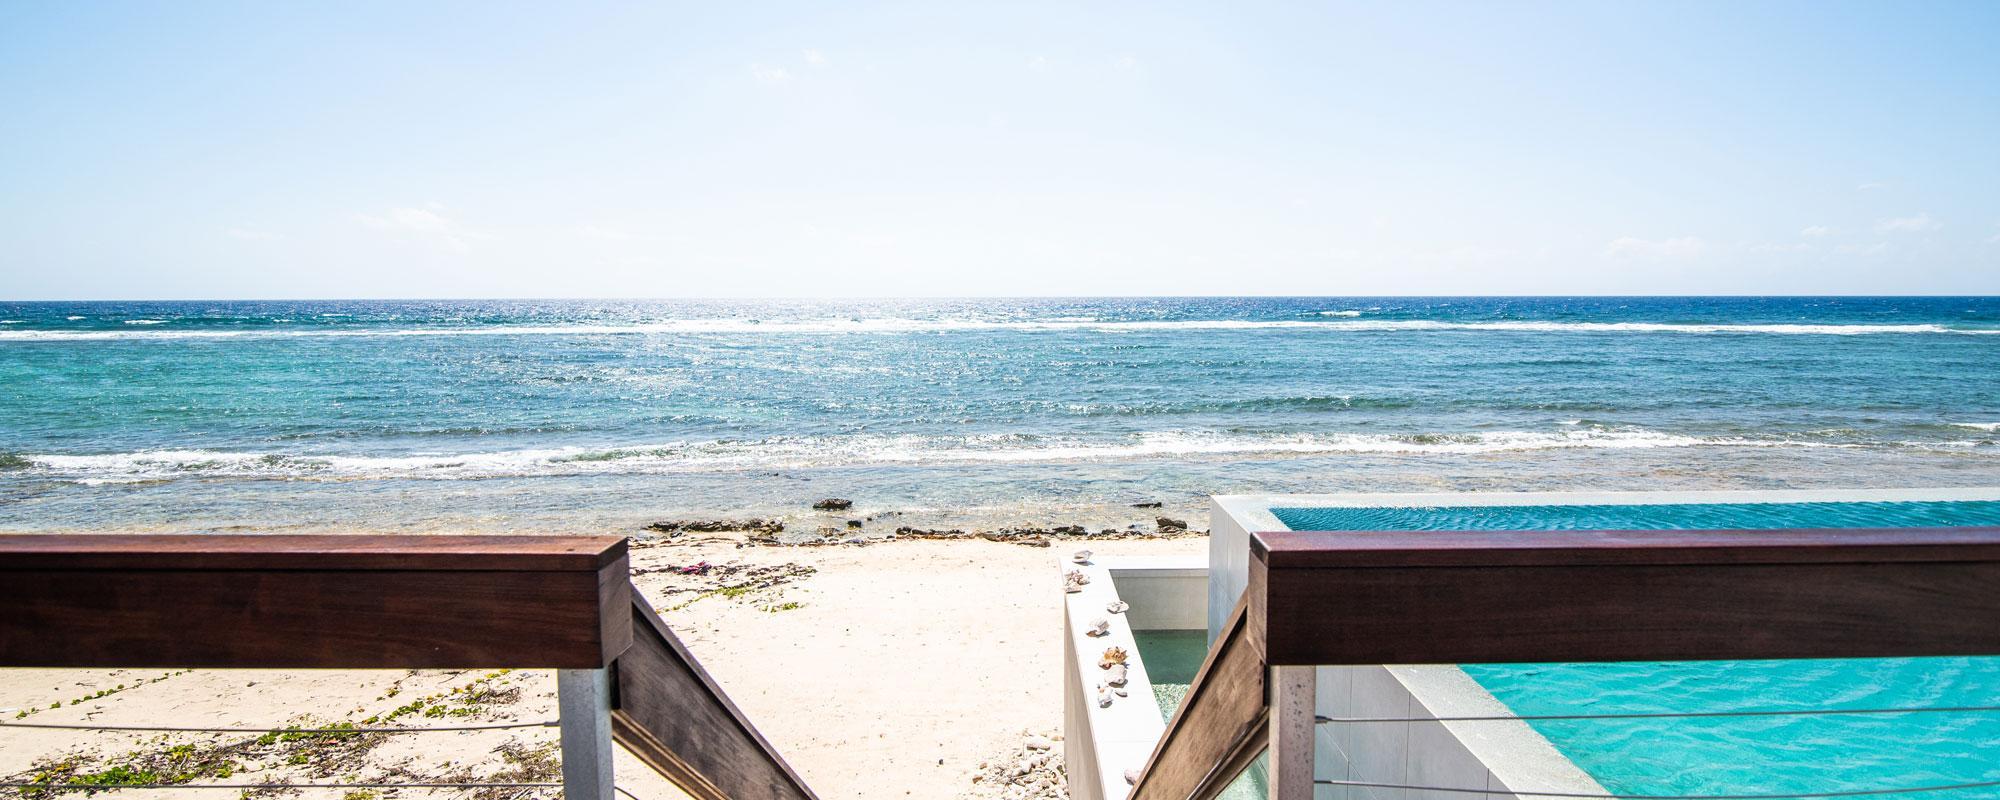 cayman island residency program